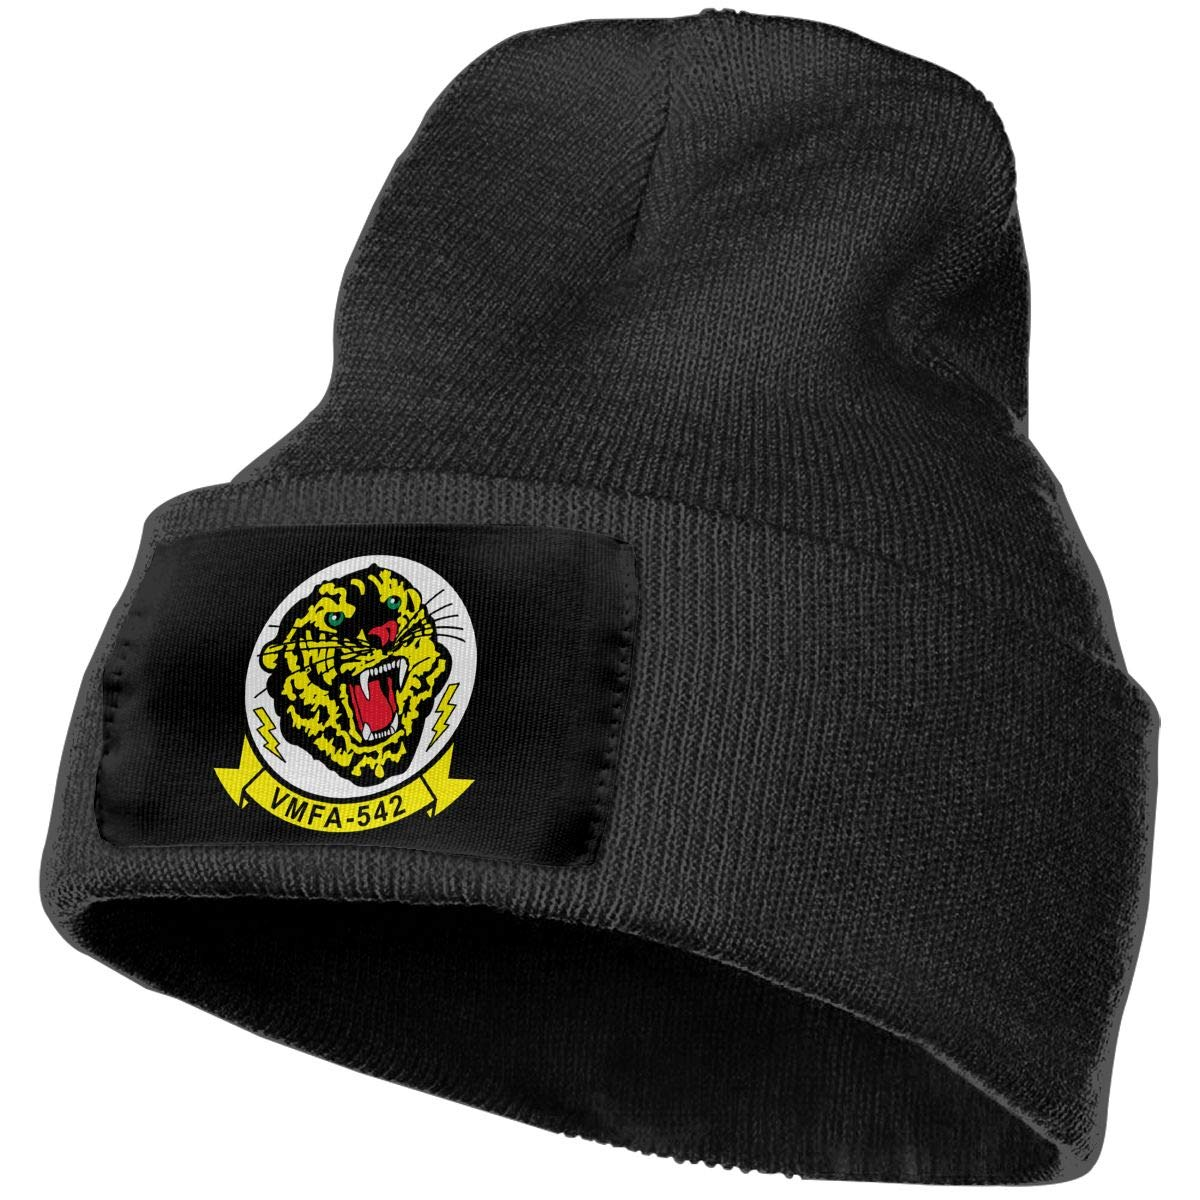 USMC VMFA-542 Men/&Women Warm Winter Knit Plain Beanie Hat Skull Cap Acrylic Knit Cuff Hat